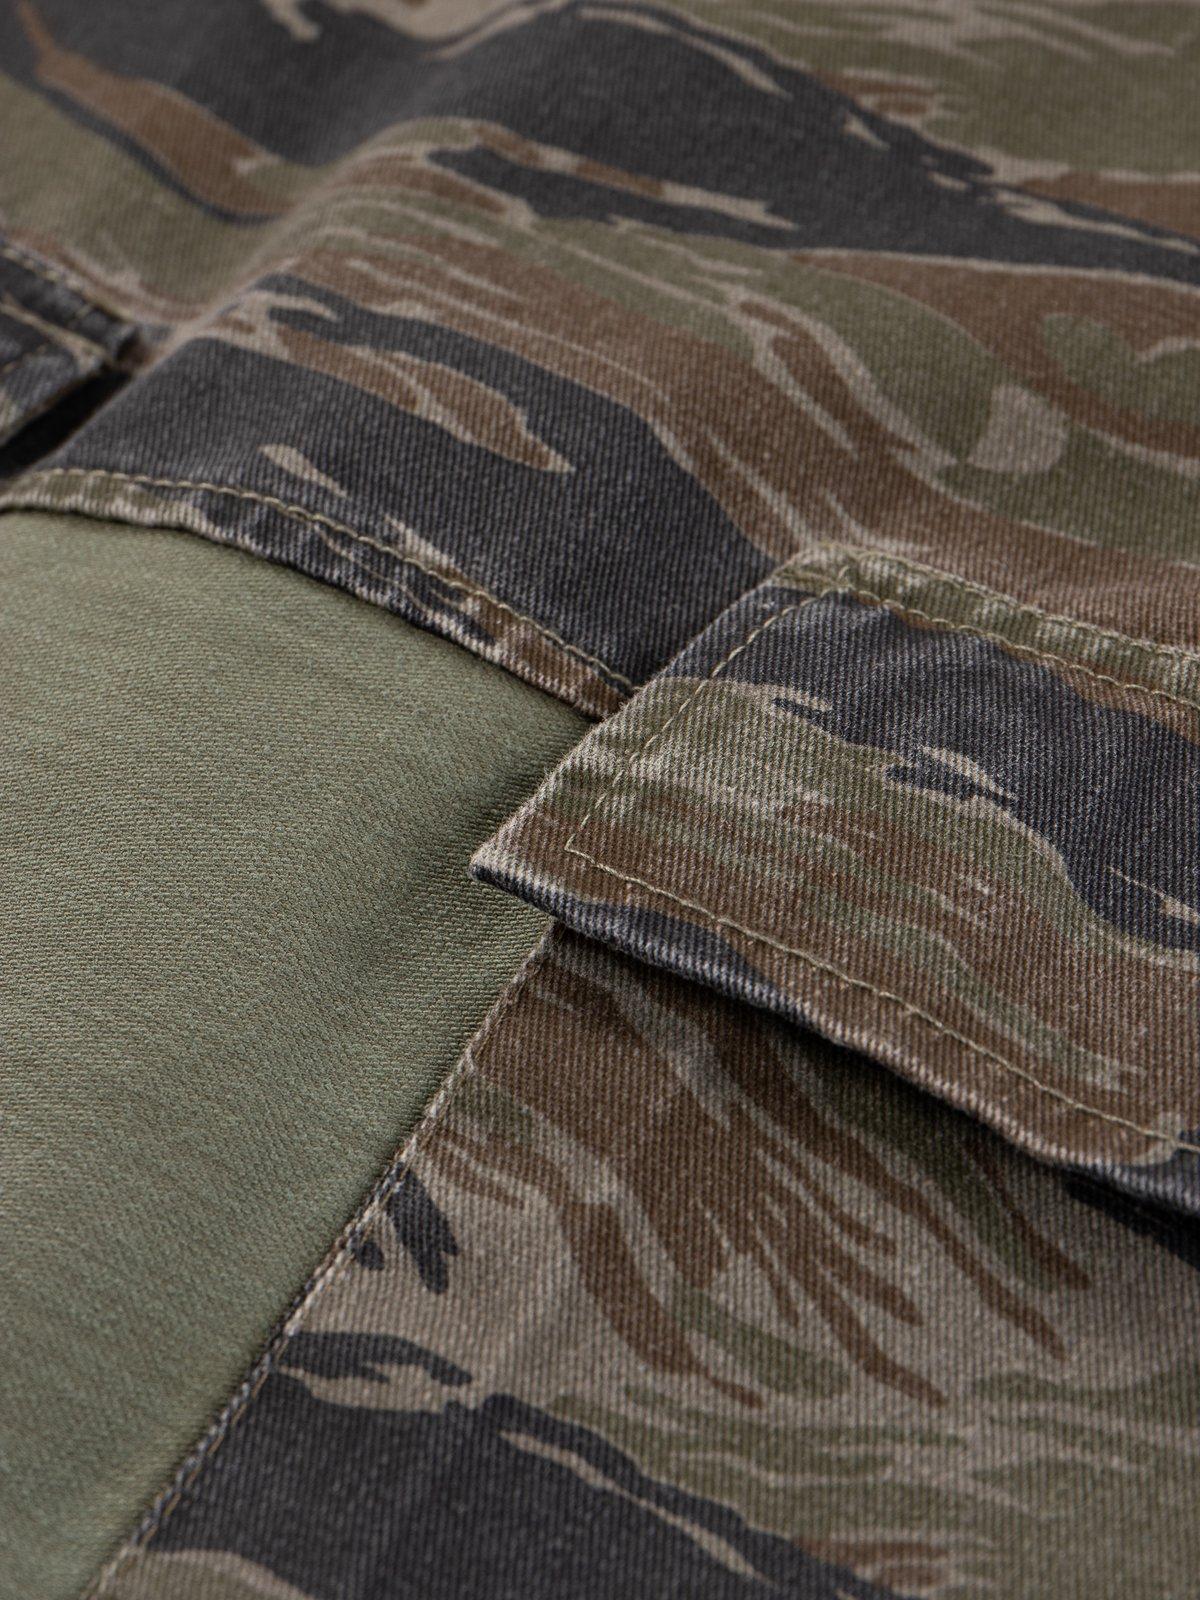 Reworks Camo/Olive Field Jacket - Image 8